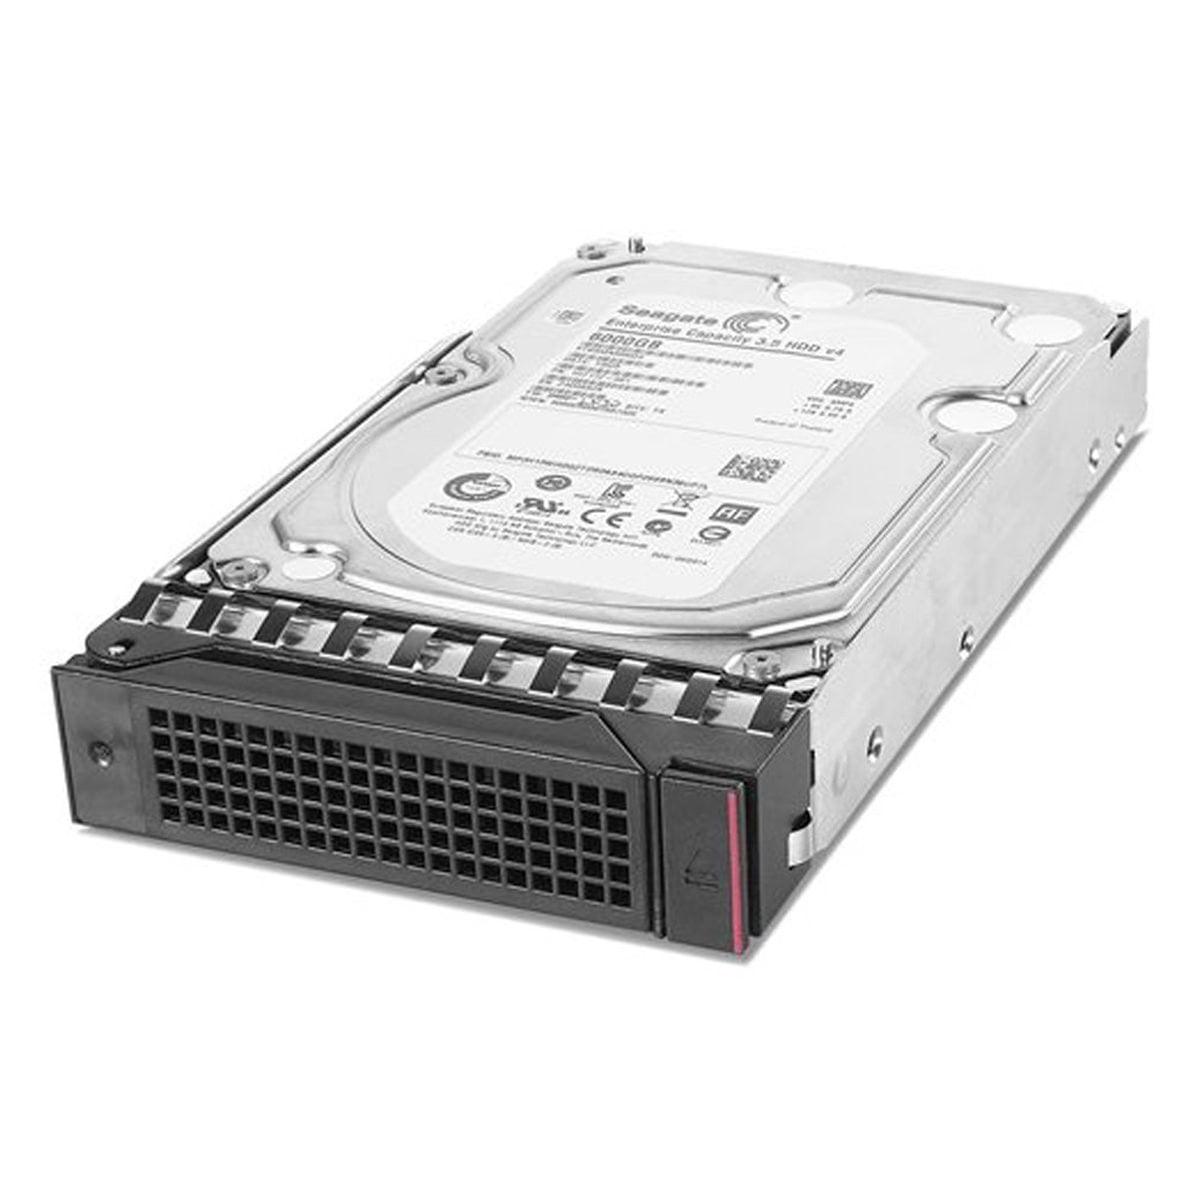 Lenovo 600 GB Hard Drive 00WG680 Hot-swap 3.5 SAS 12Gb/s 15000 rpm